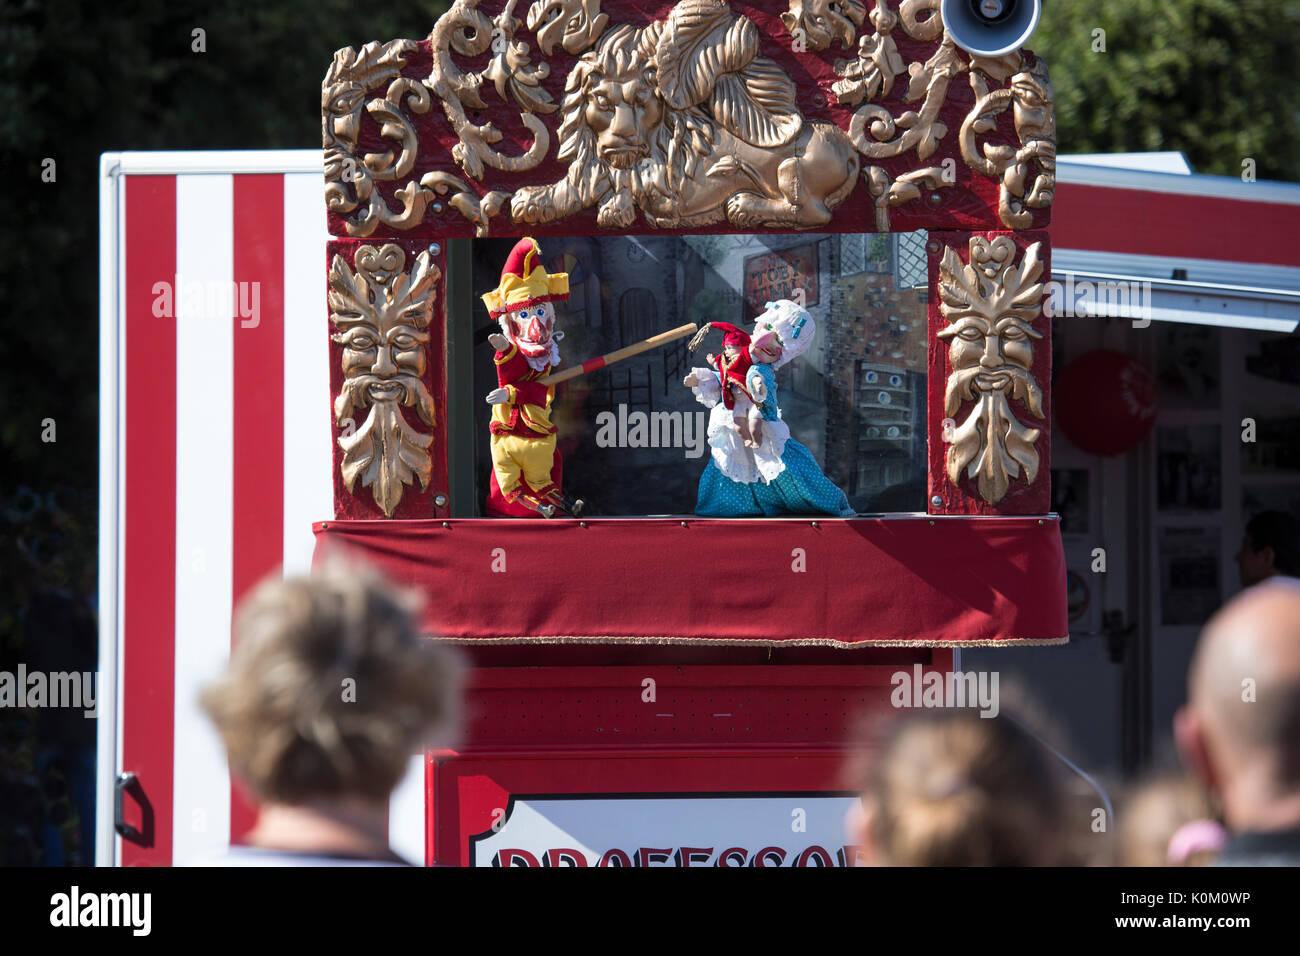 Punch and Judy show at the Llandudno seaside - Stock Image